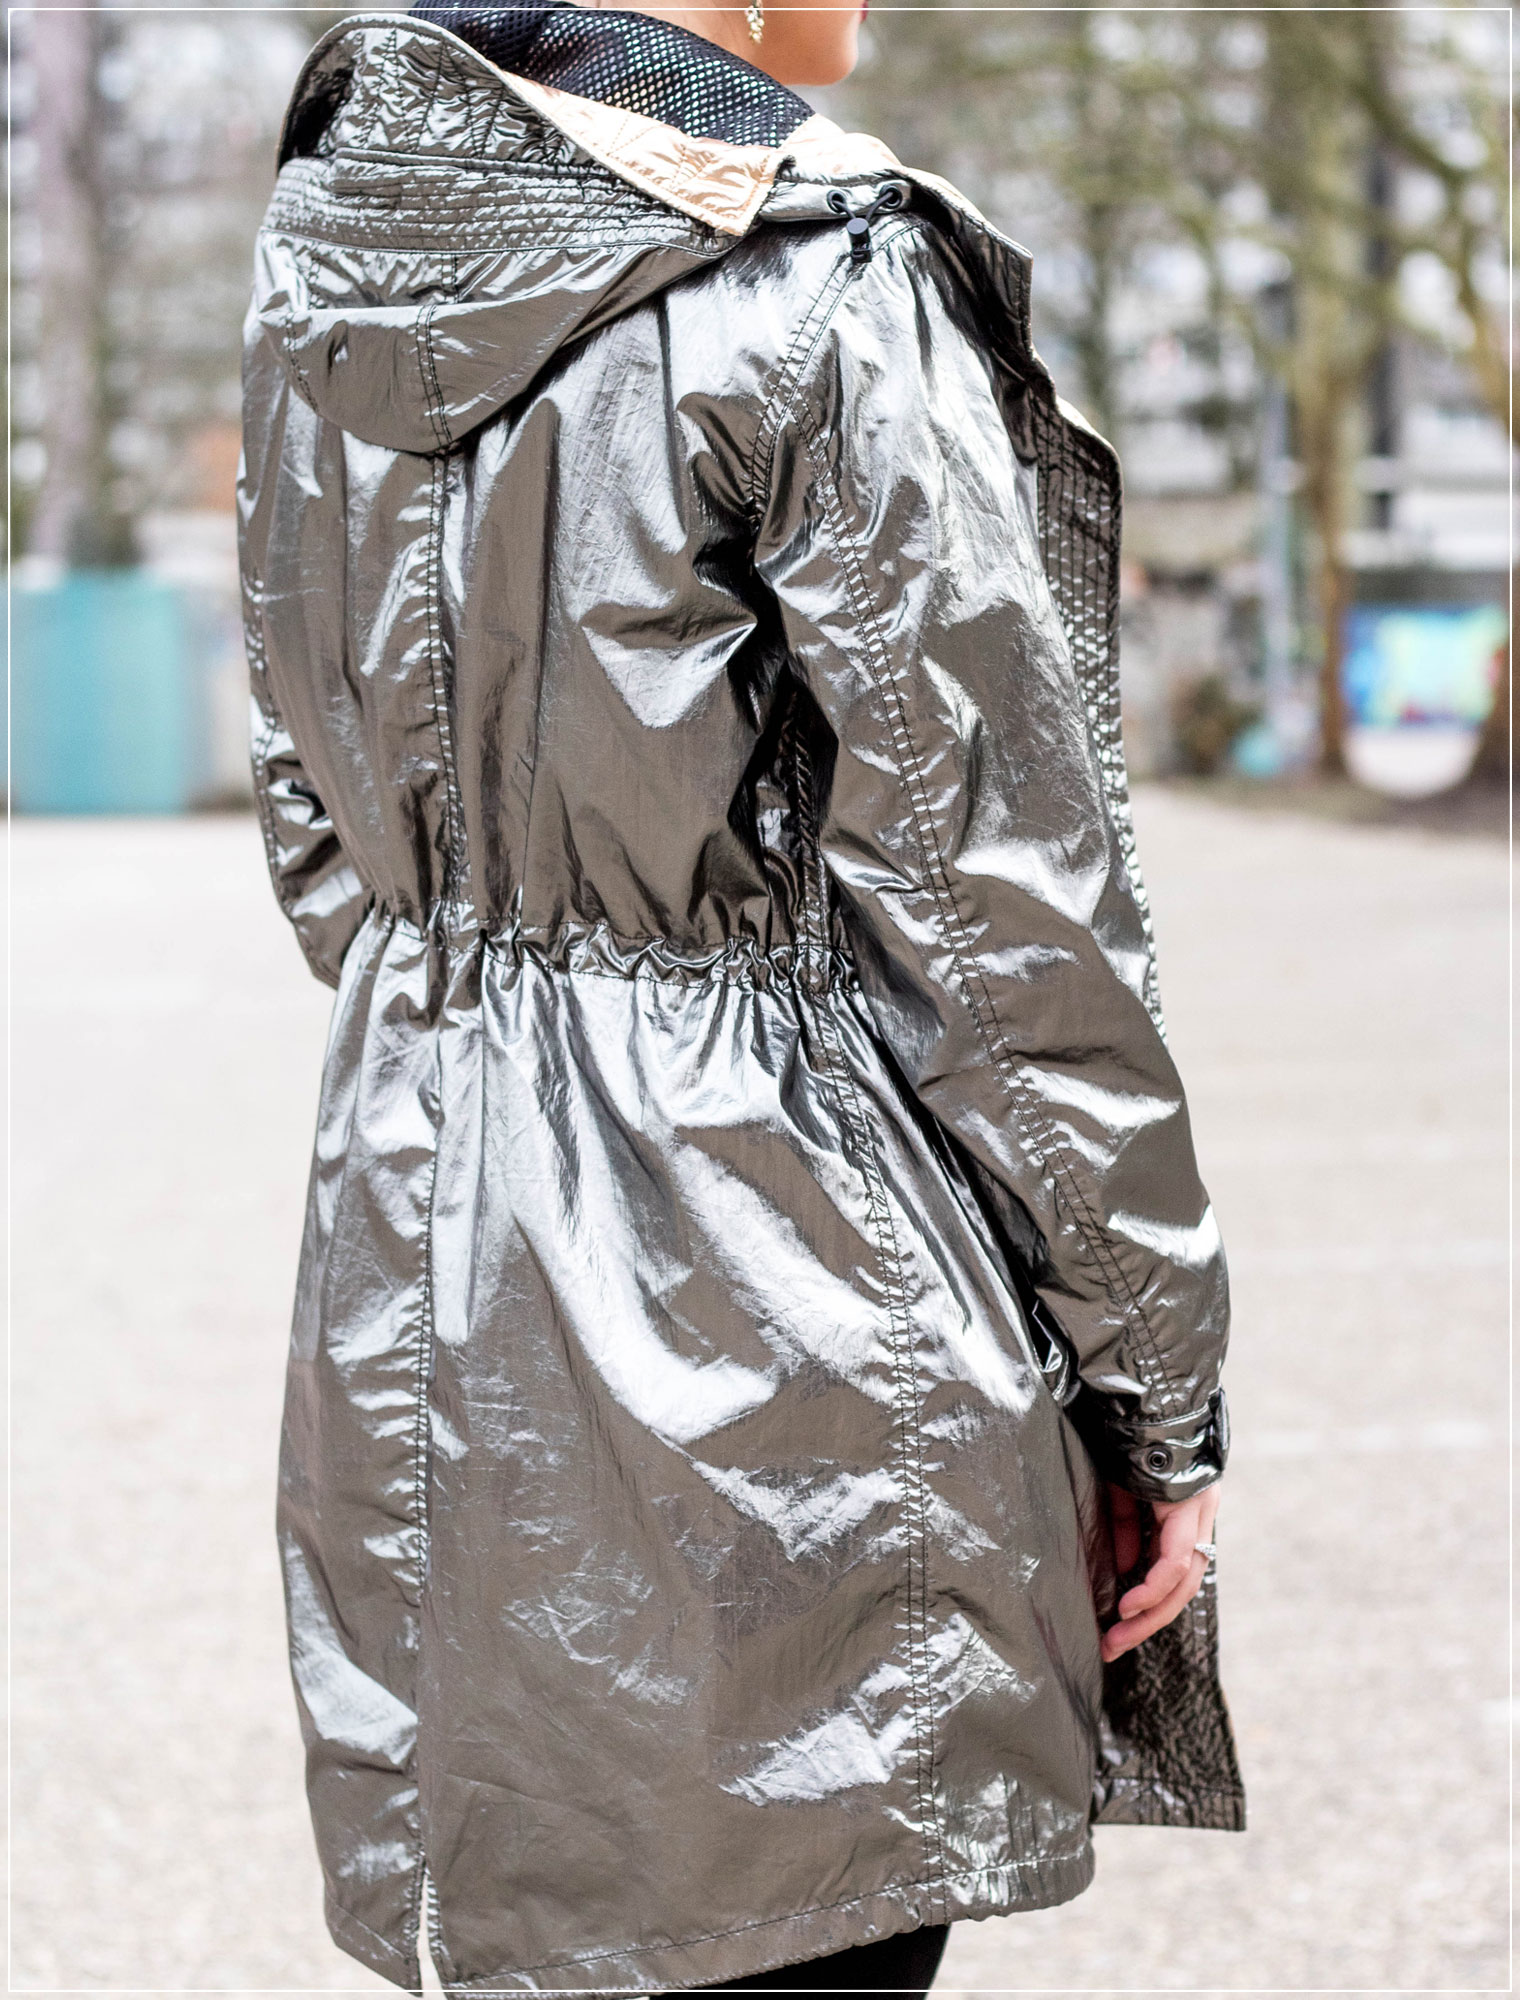 Metallic, Regenjacke, Huelle gestalten, Regenmangel, Springstyle, Frühlingslook, Übergangsjacke, Modebloggerin, Frühlingsoutfit, Fashionbloggerin, Modeblog, Ruhrgebiet